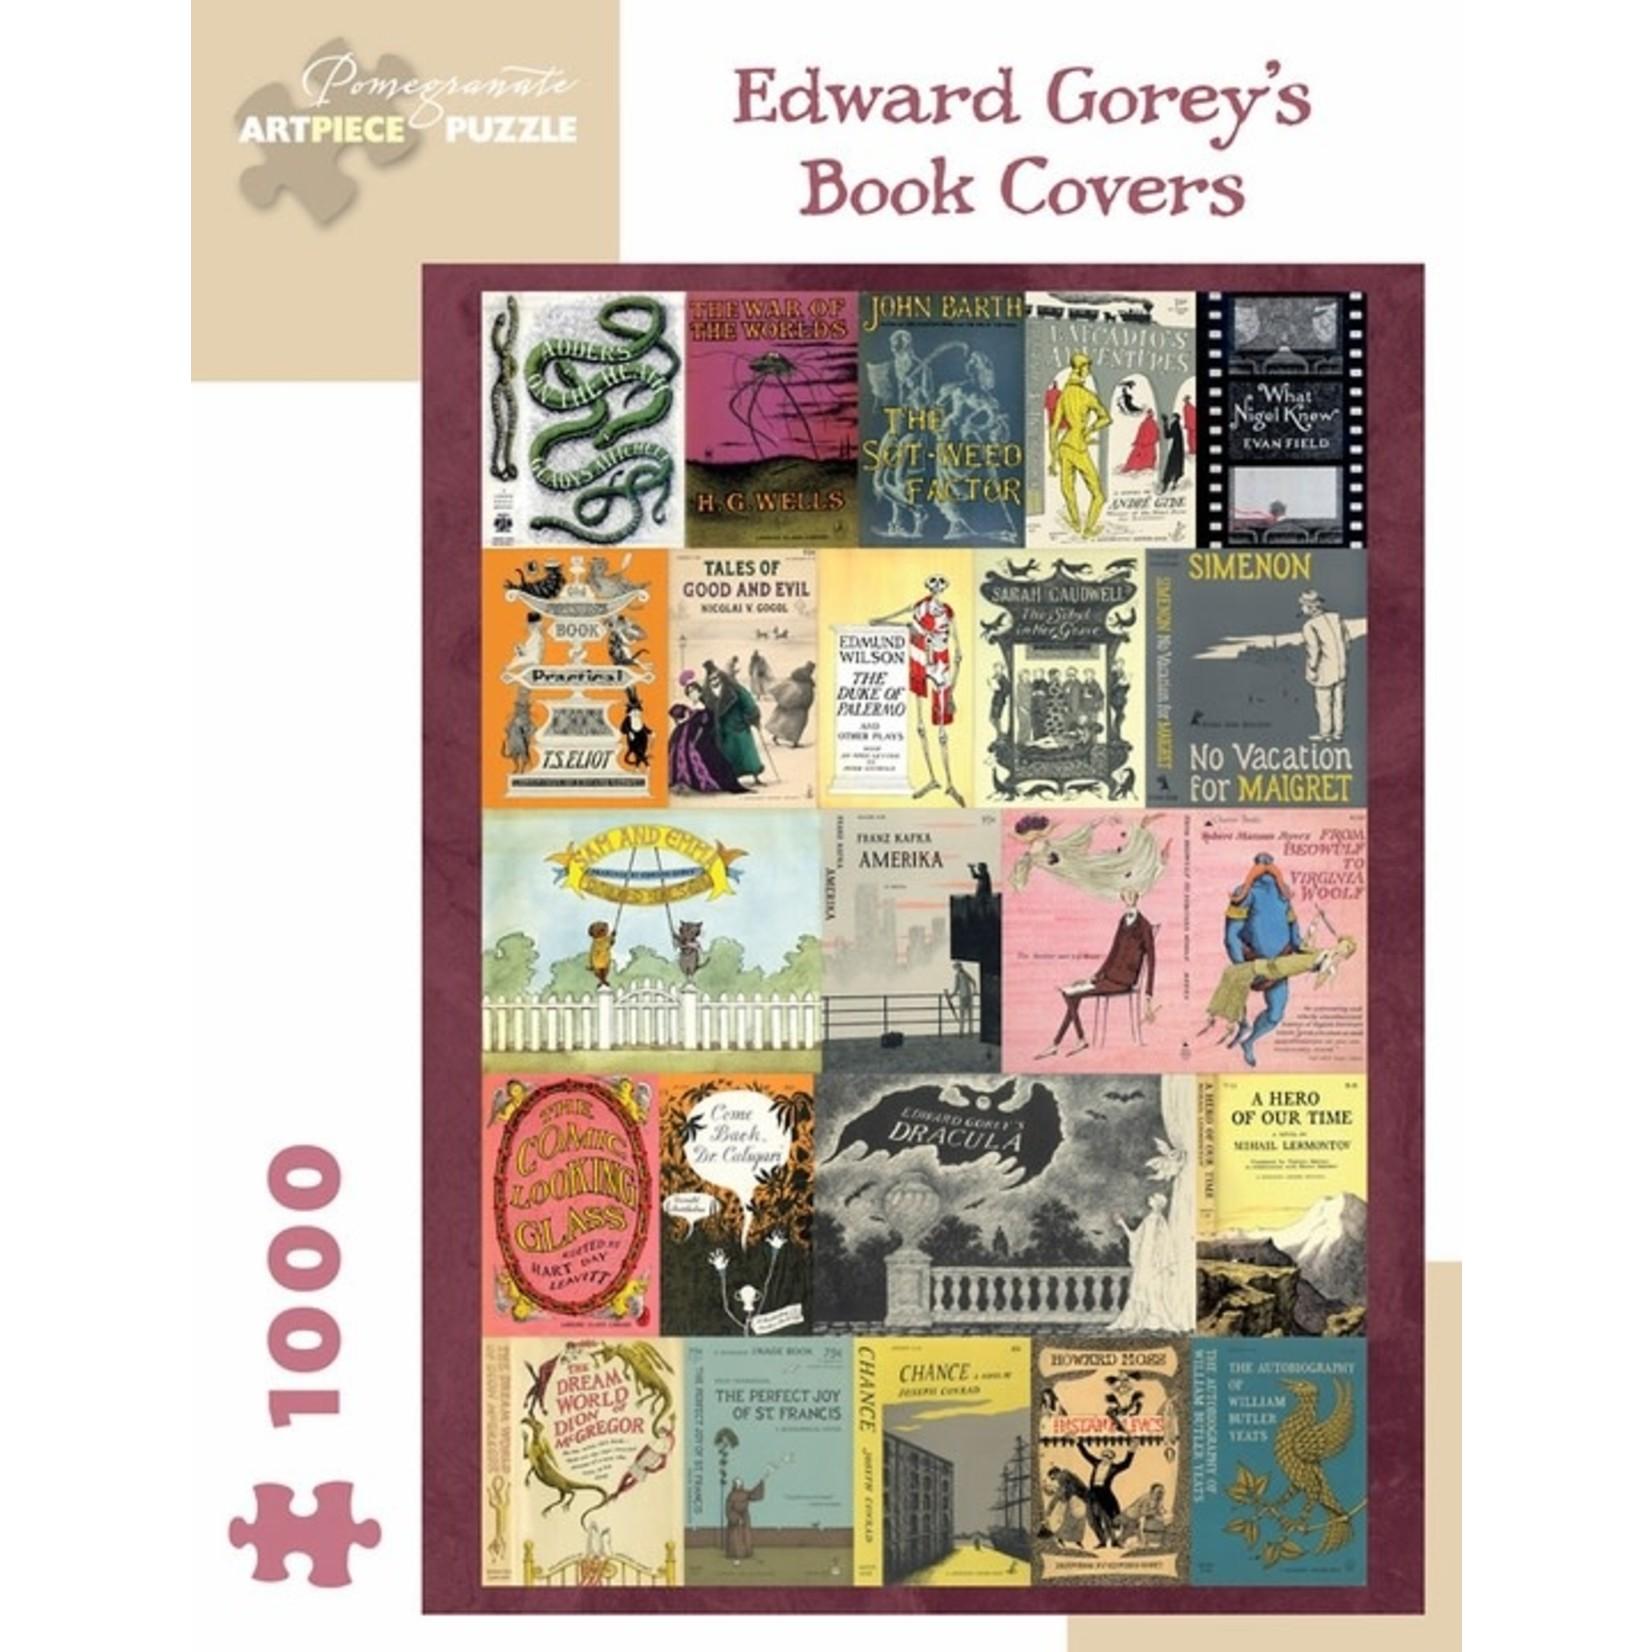 Pomegranate Edward Gorey's Book Covers - 1000 Piece Jigsaw Puzzle